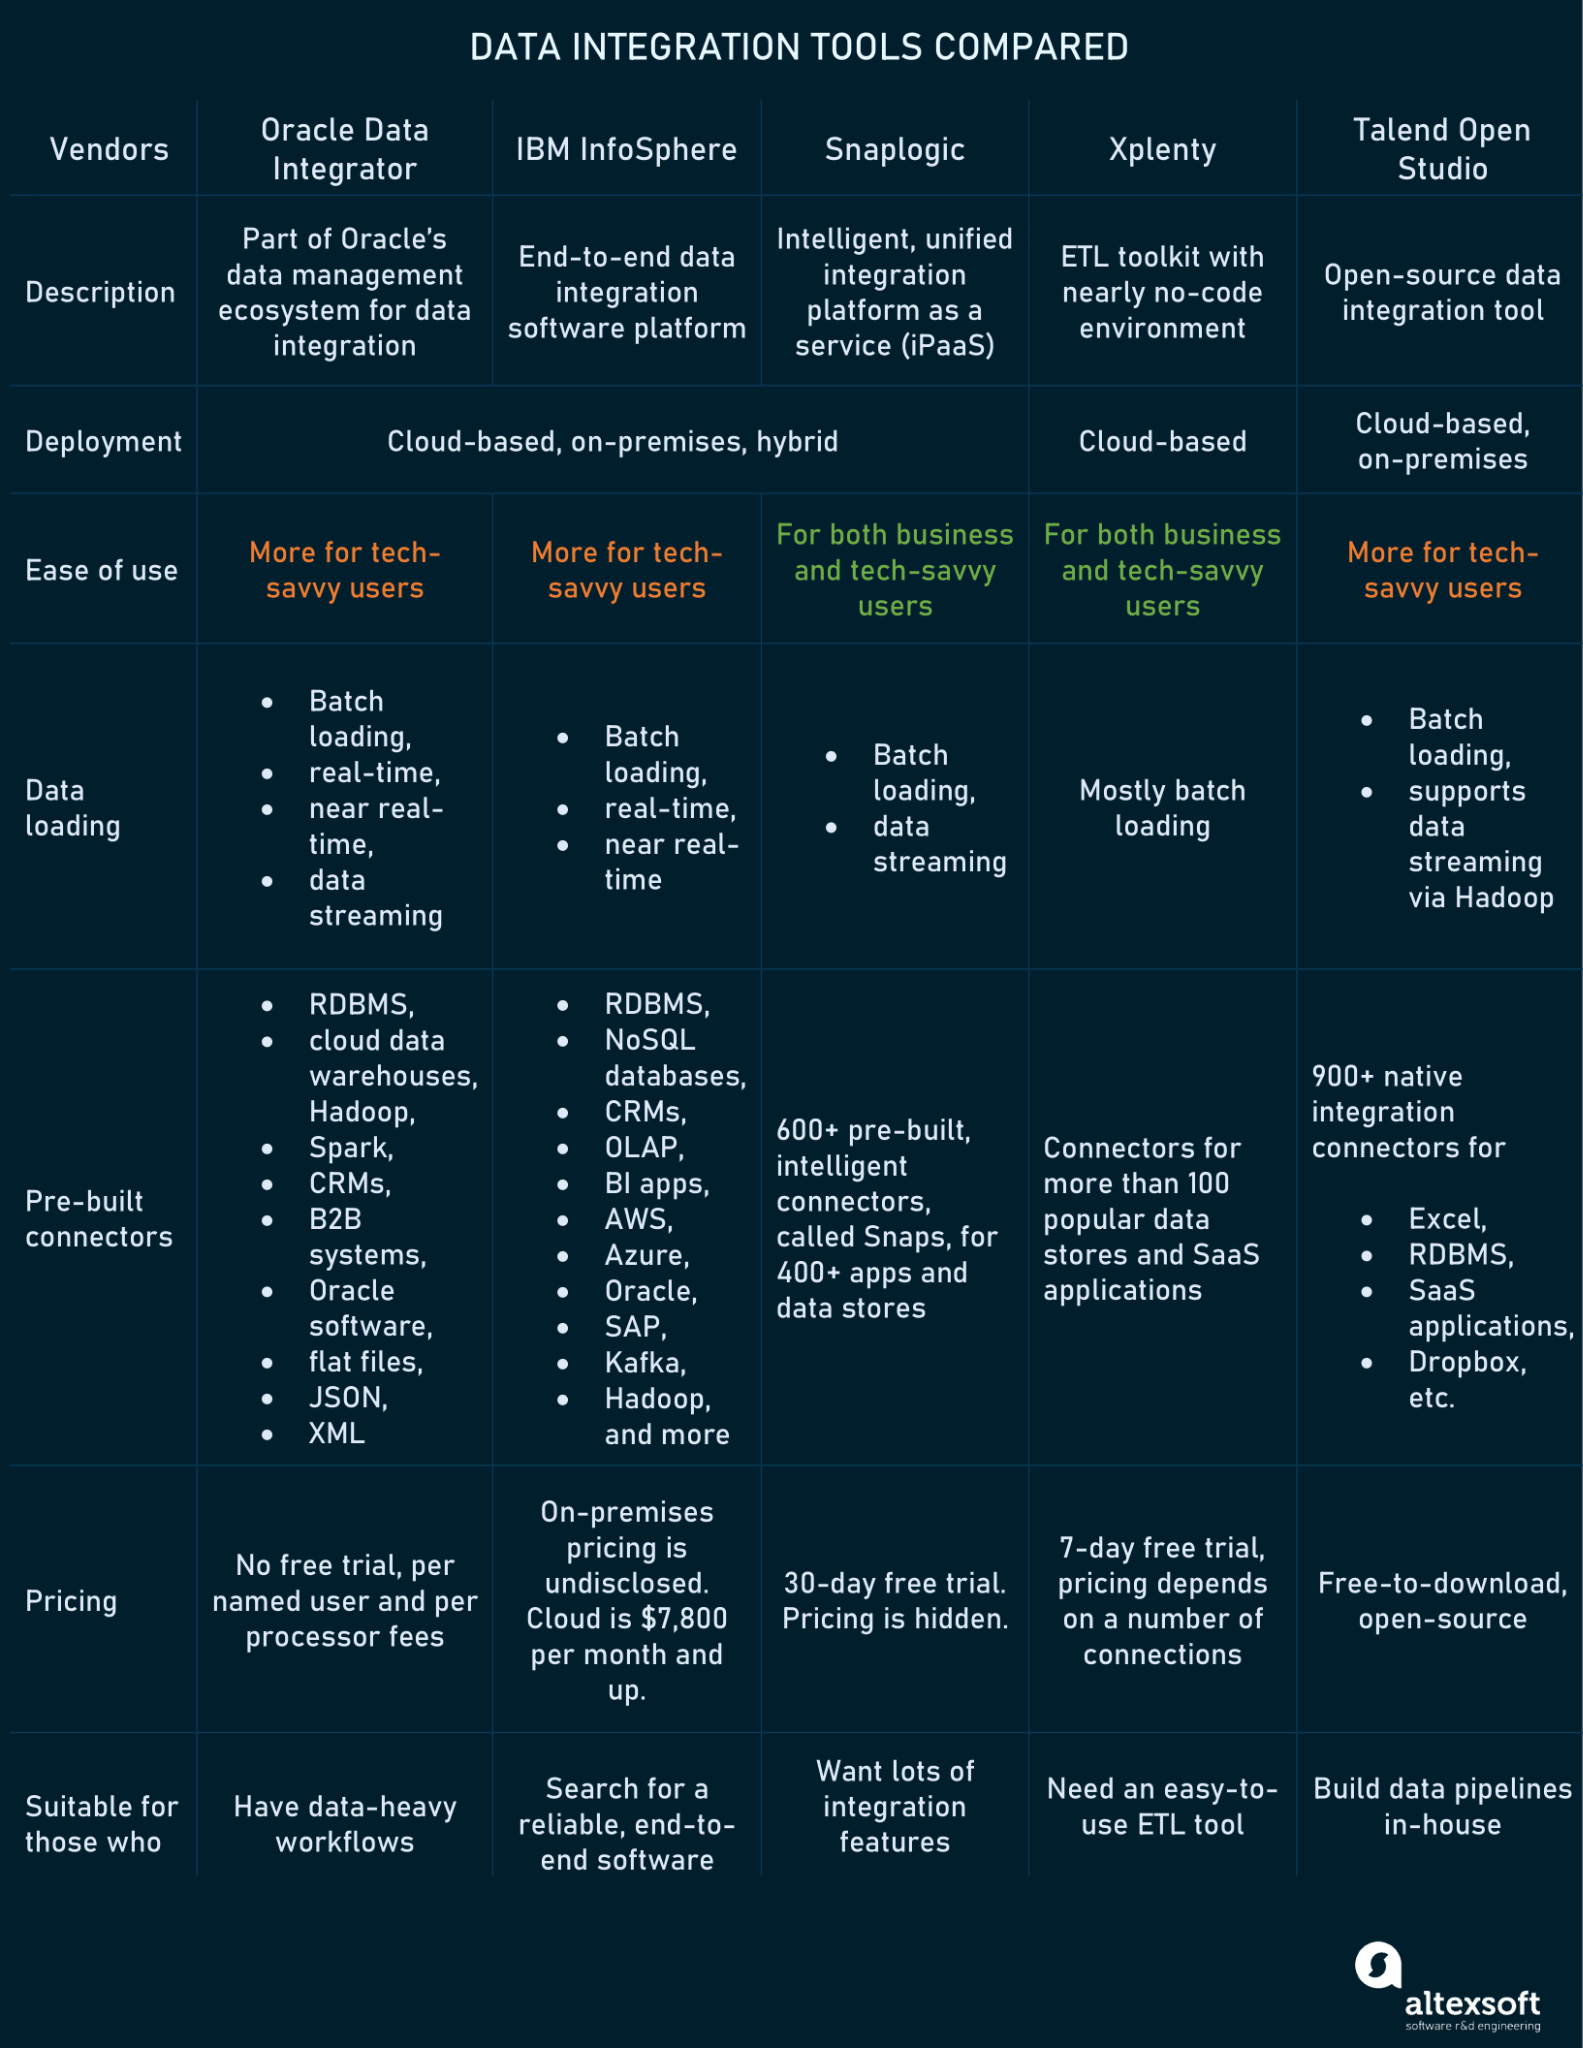 Comparison of data integration tools